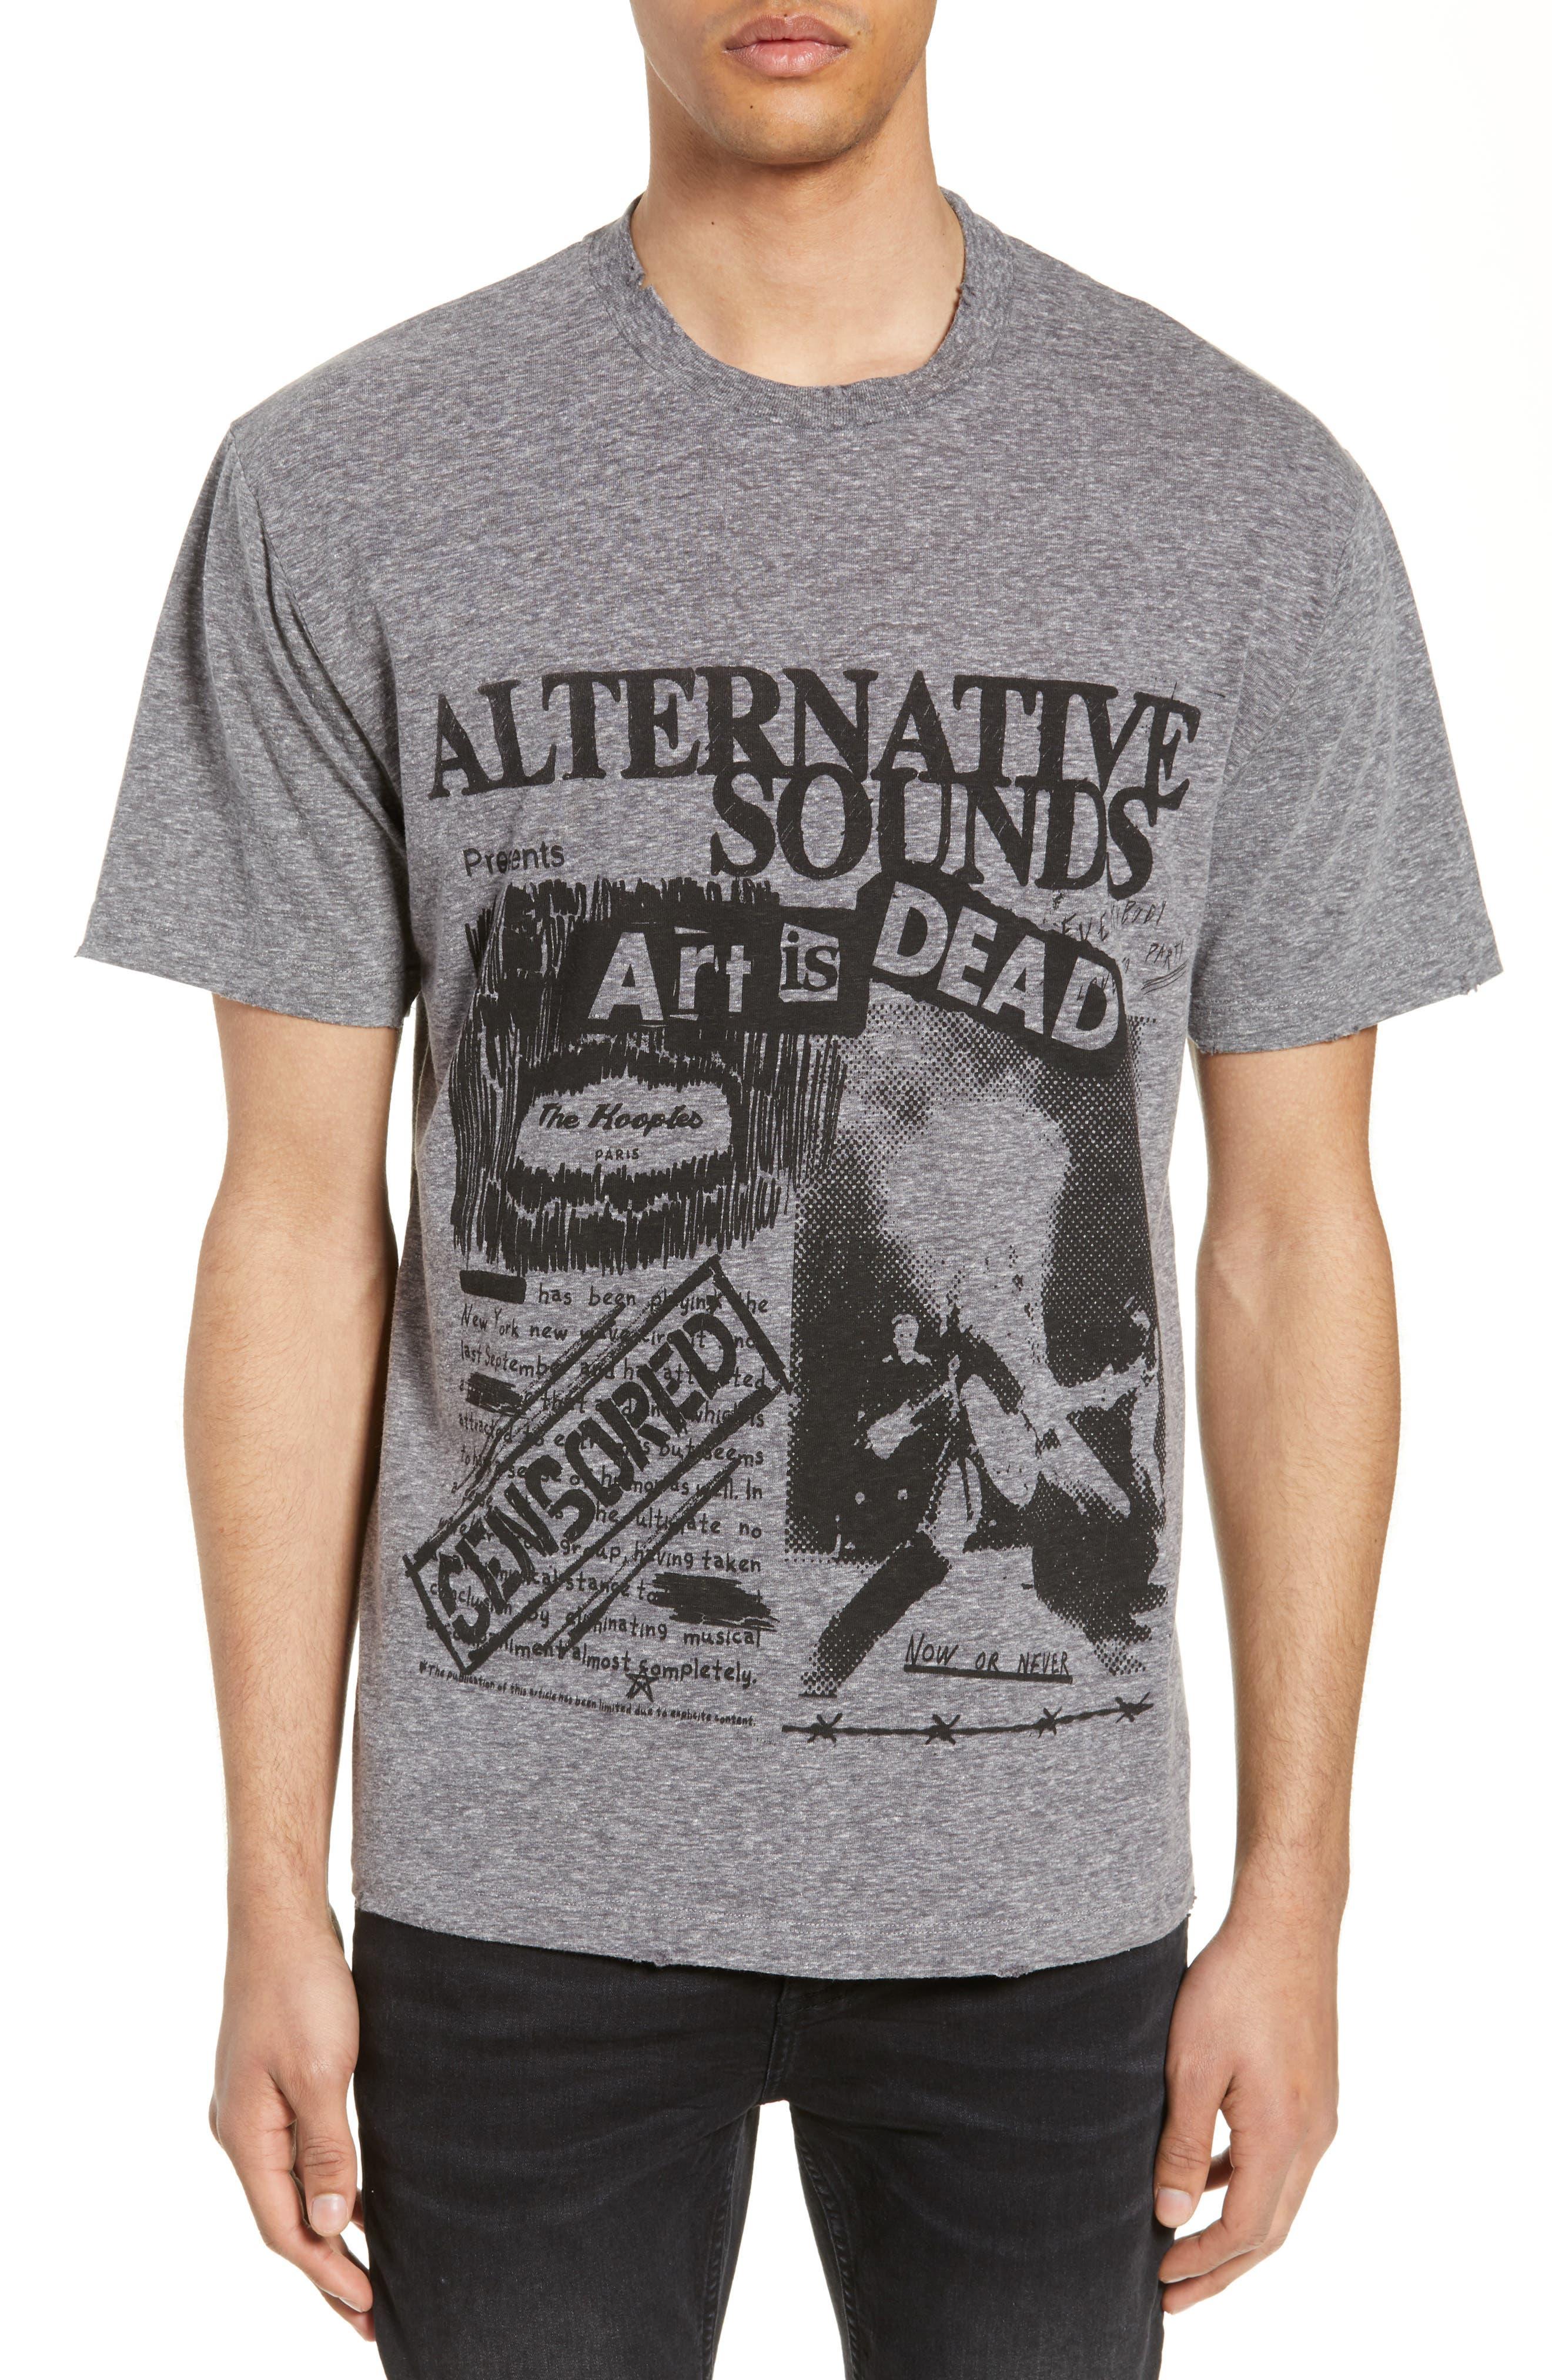 THE KOOPLES, Alternative Sounds Graphic T-Shirt, Main thumbnail 1, color, GREY